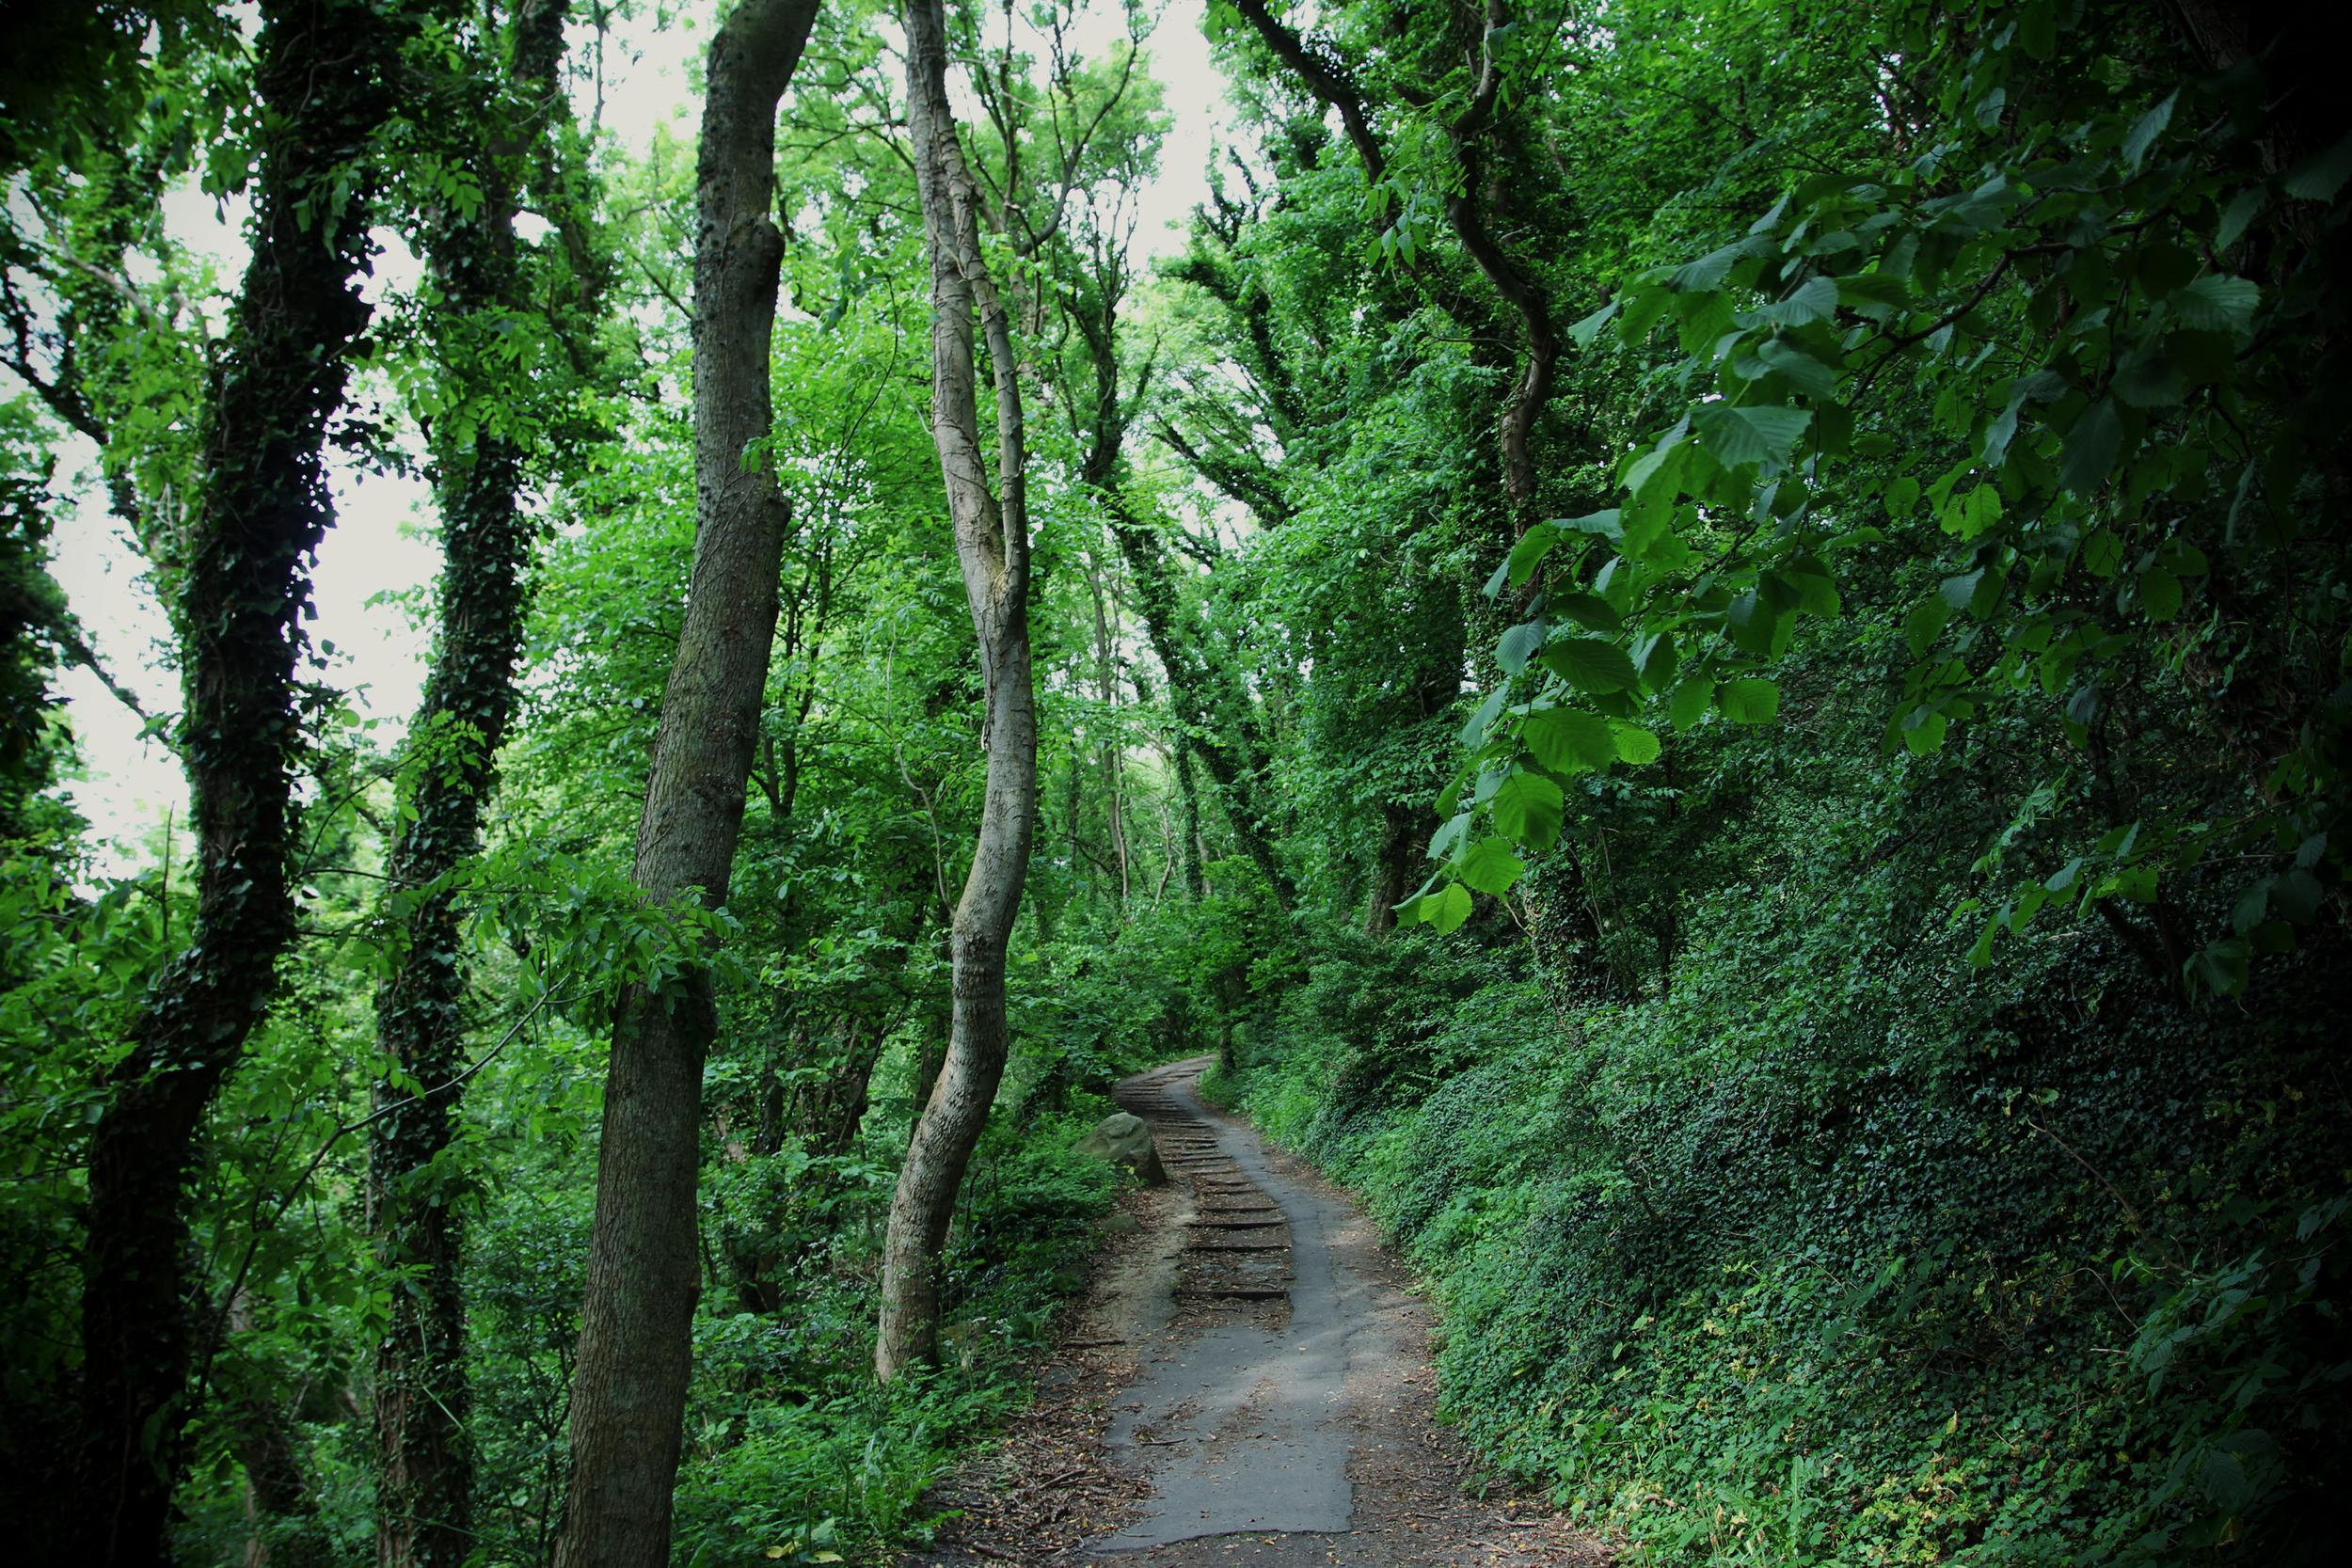 2015_07_Life-of-Pix-free-stock-photos-nature-green-trees-juliacaesar.jpg